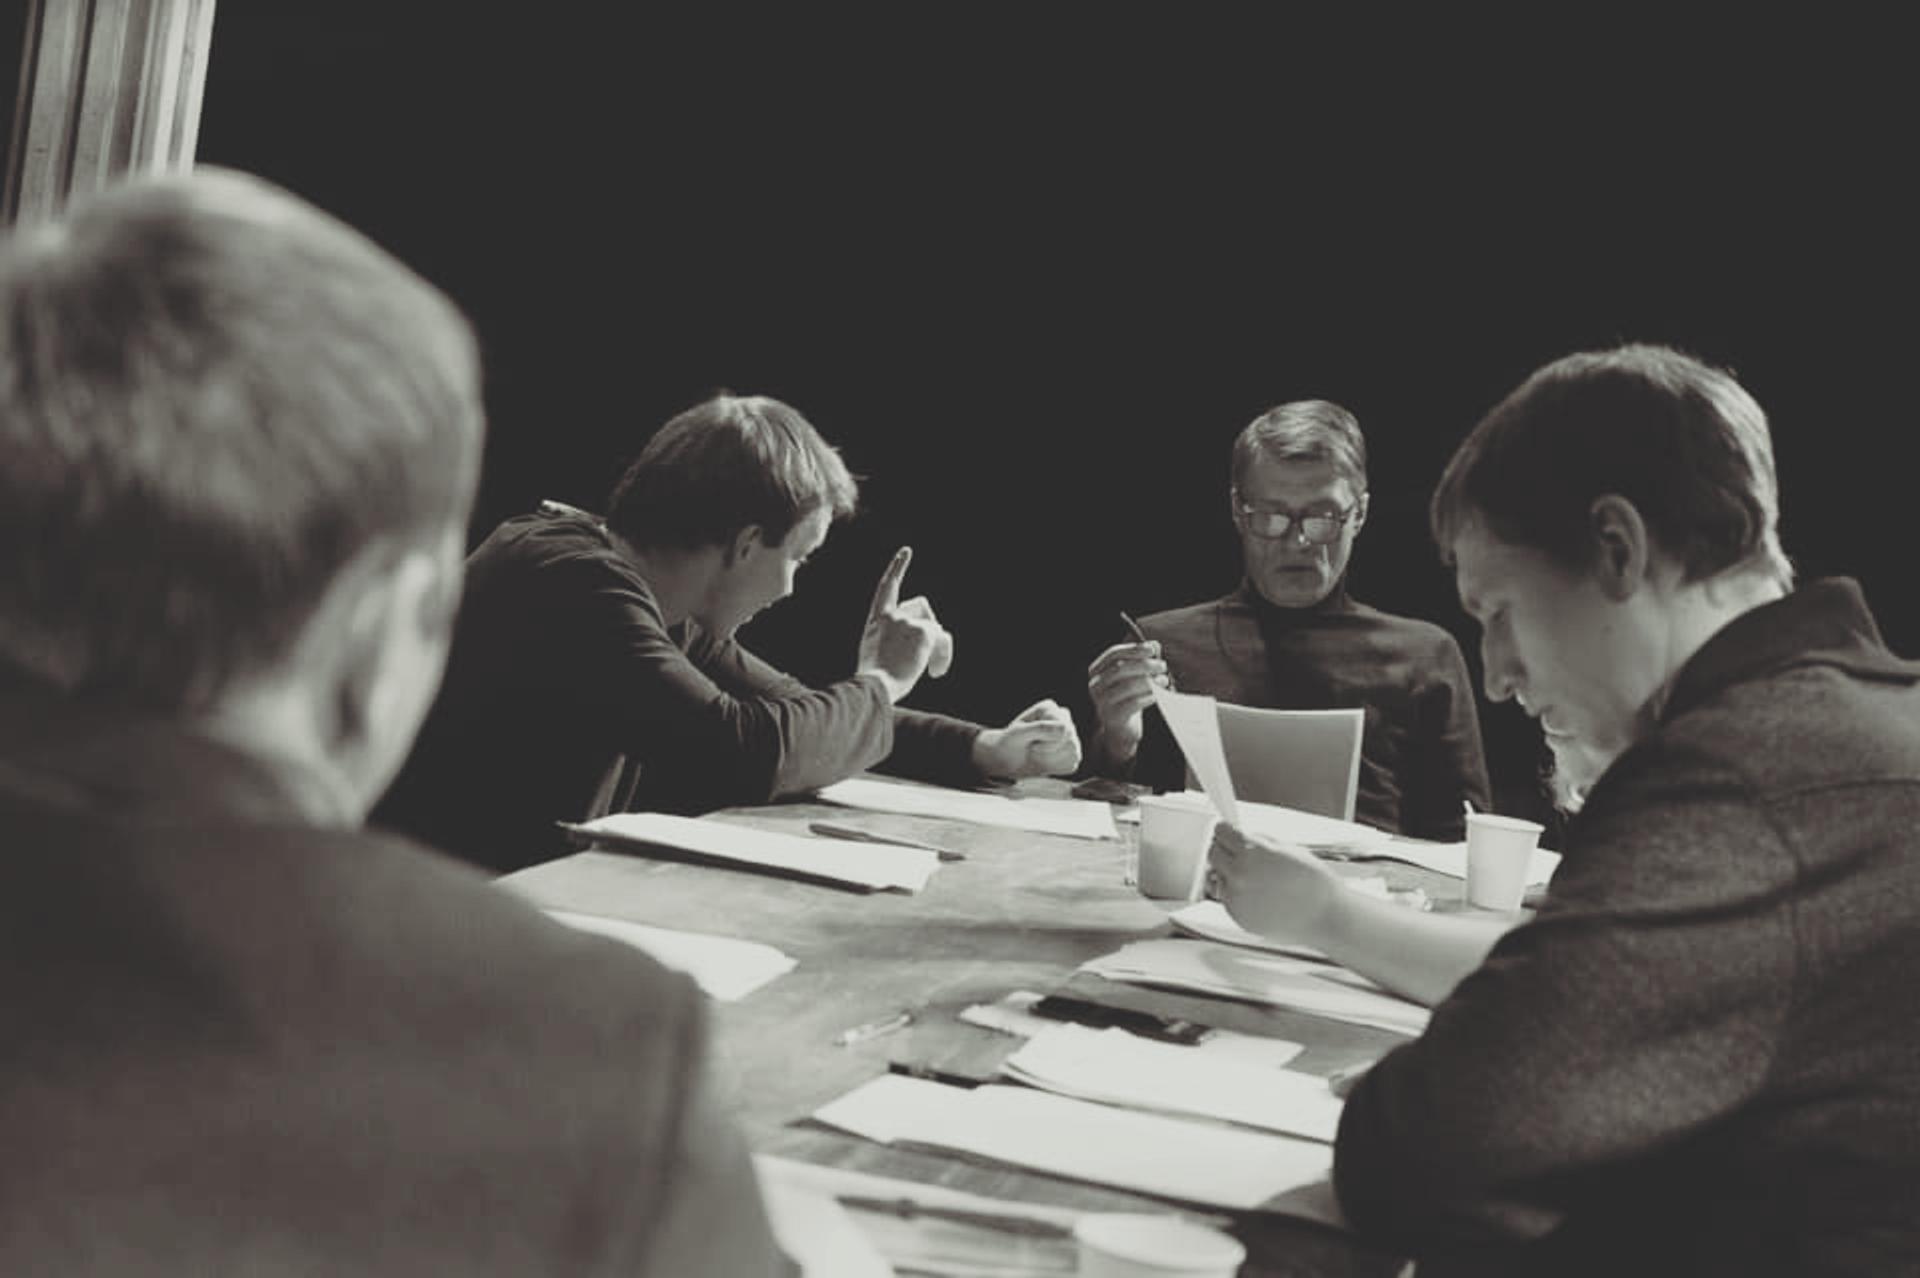 На репетиции спектакля Школа жен Театра Маяковского - РИА Новости, 1920, 30.03.2021